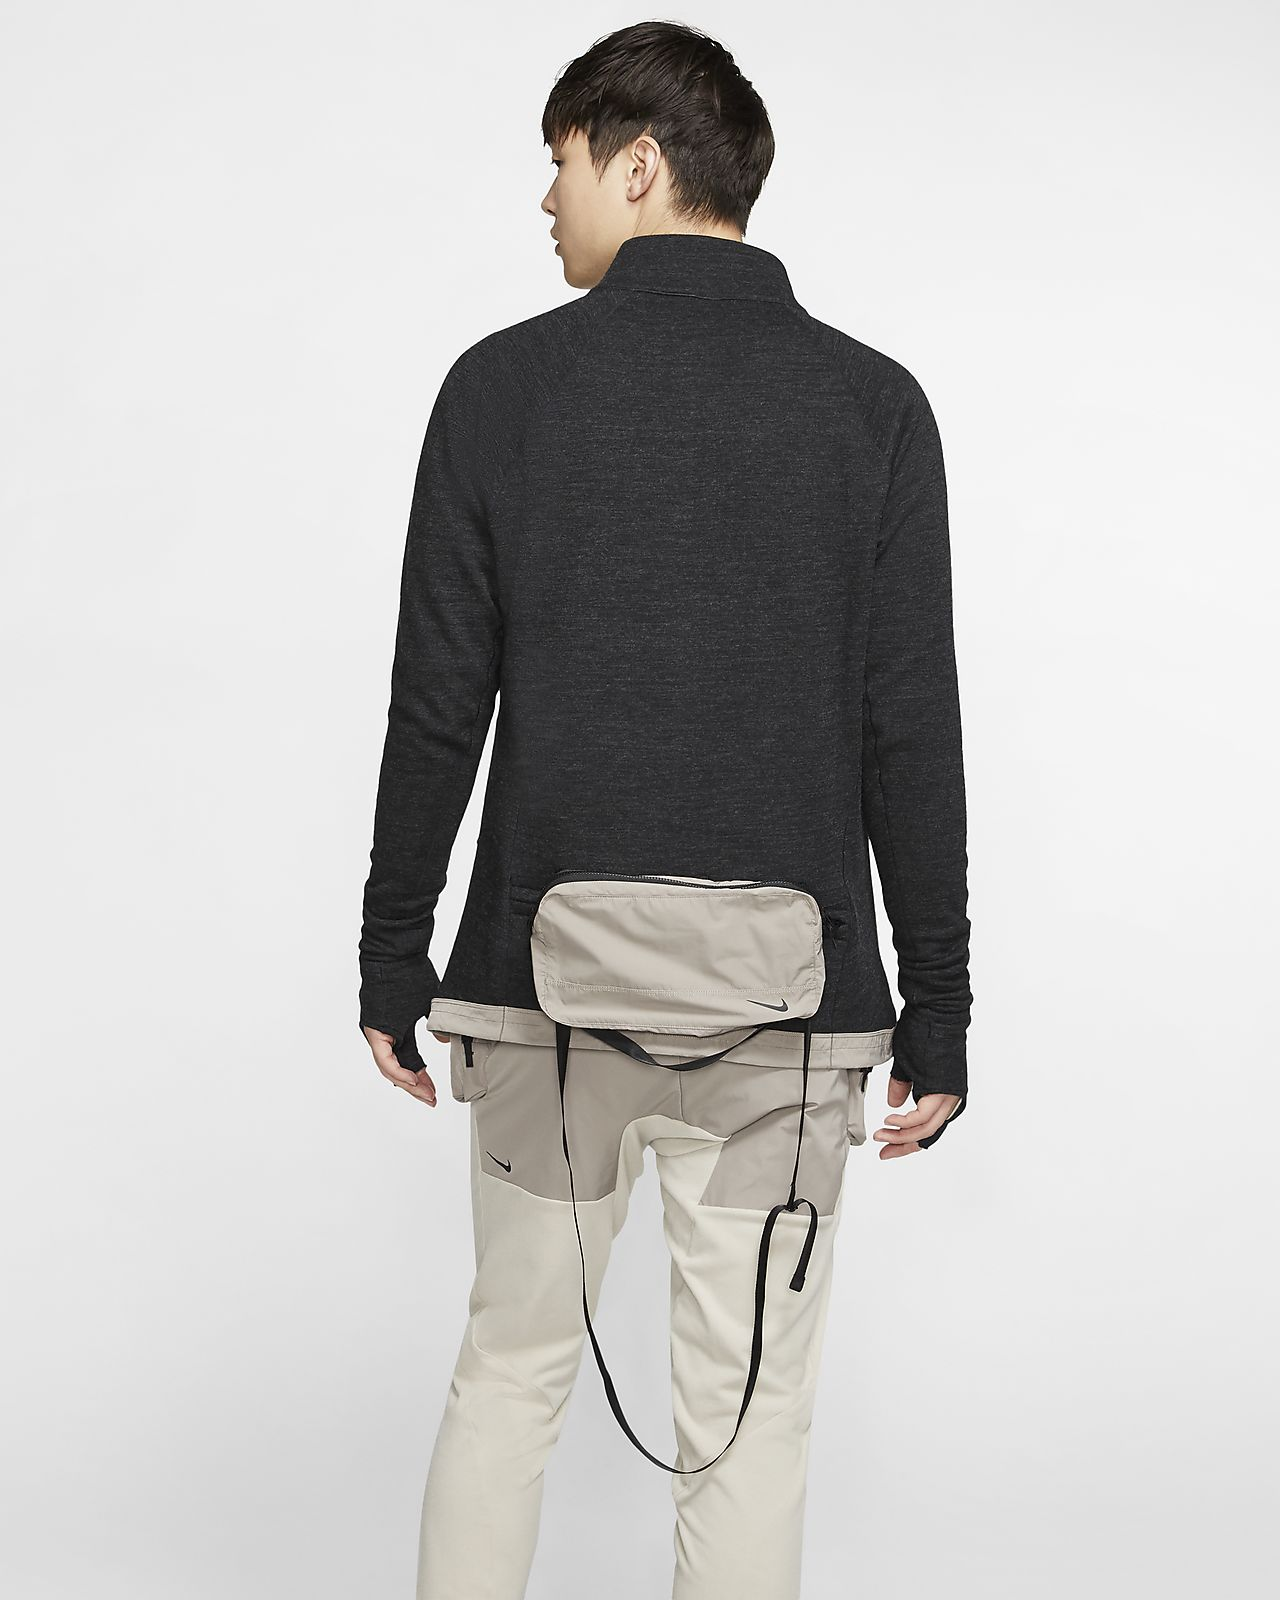 Nike Sportswear Tech Varsity Jacket (Khaki Black)